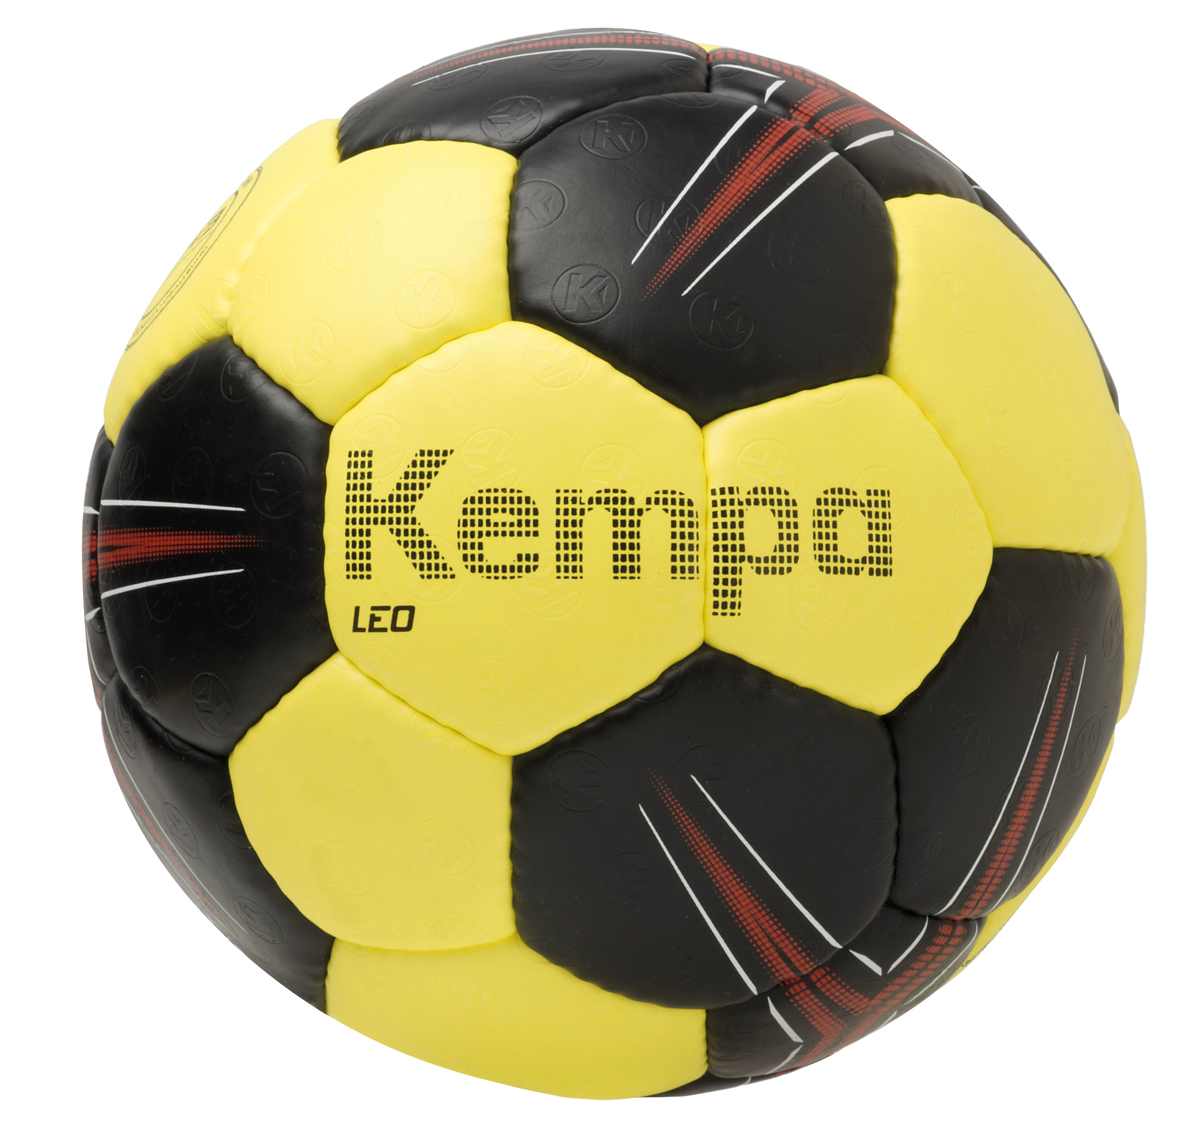 Image of   Kempa Leo Handball - Størrelse 1 - Black / Lime Gul / Rød